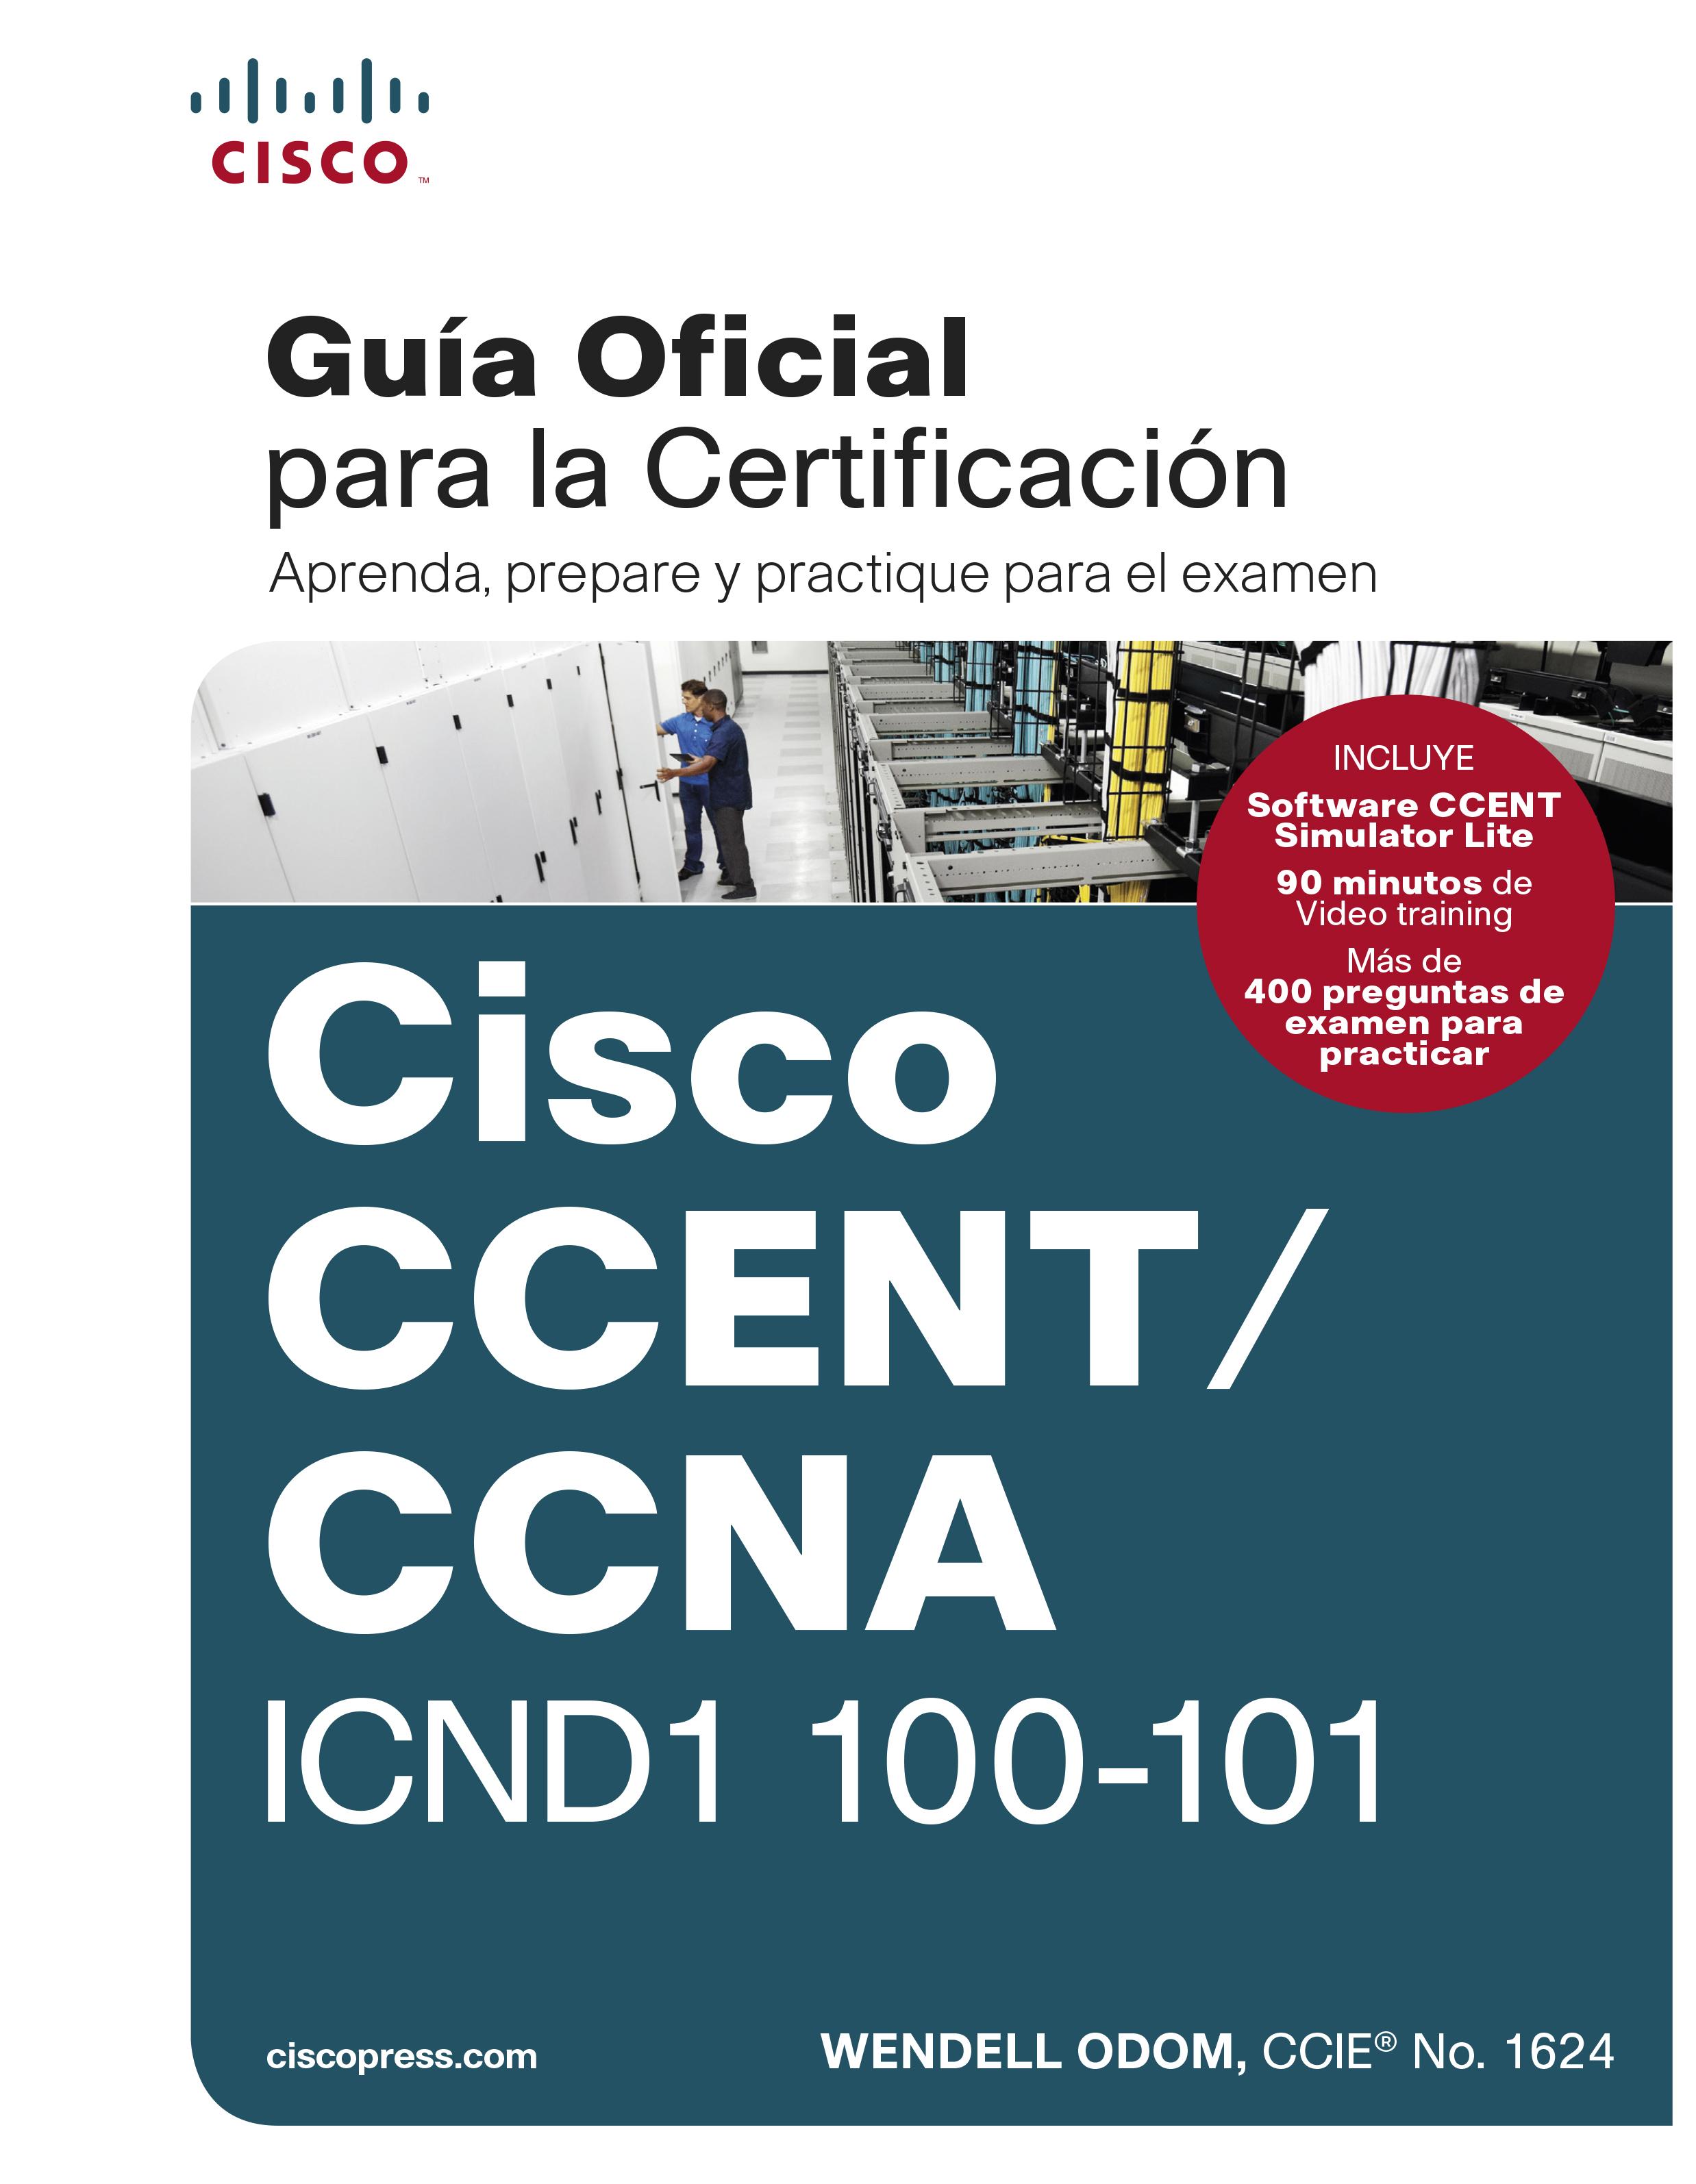 Cisco Ccent Ccna Icnd1 100 101